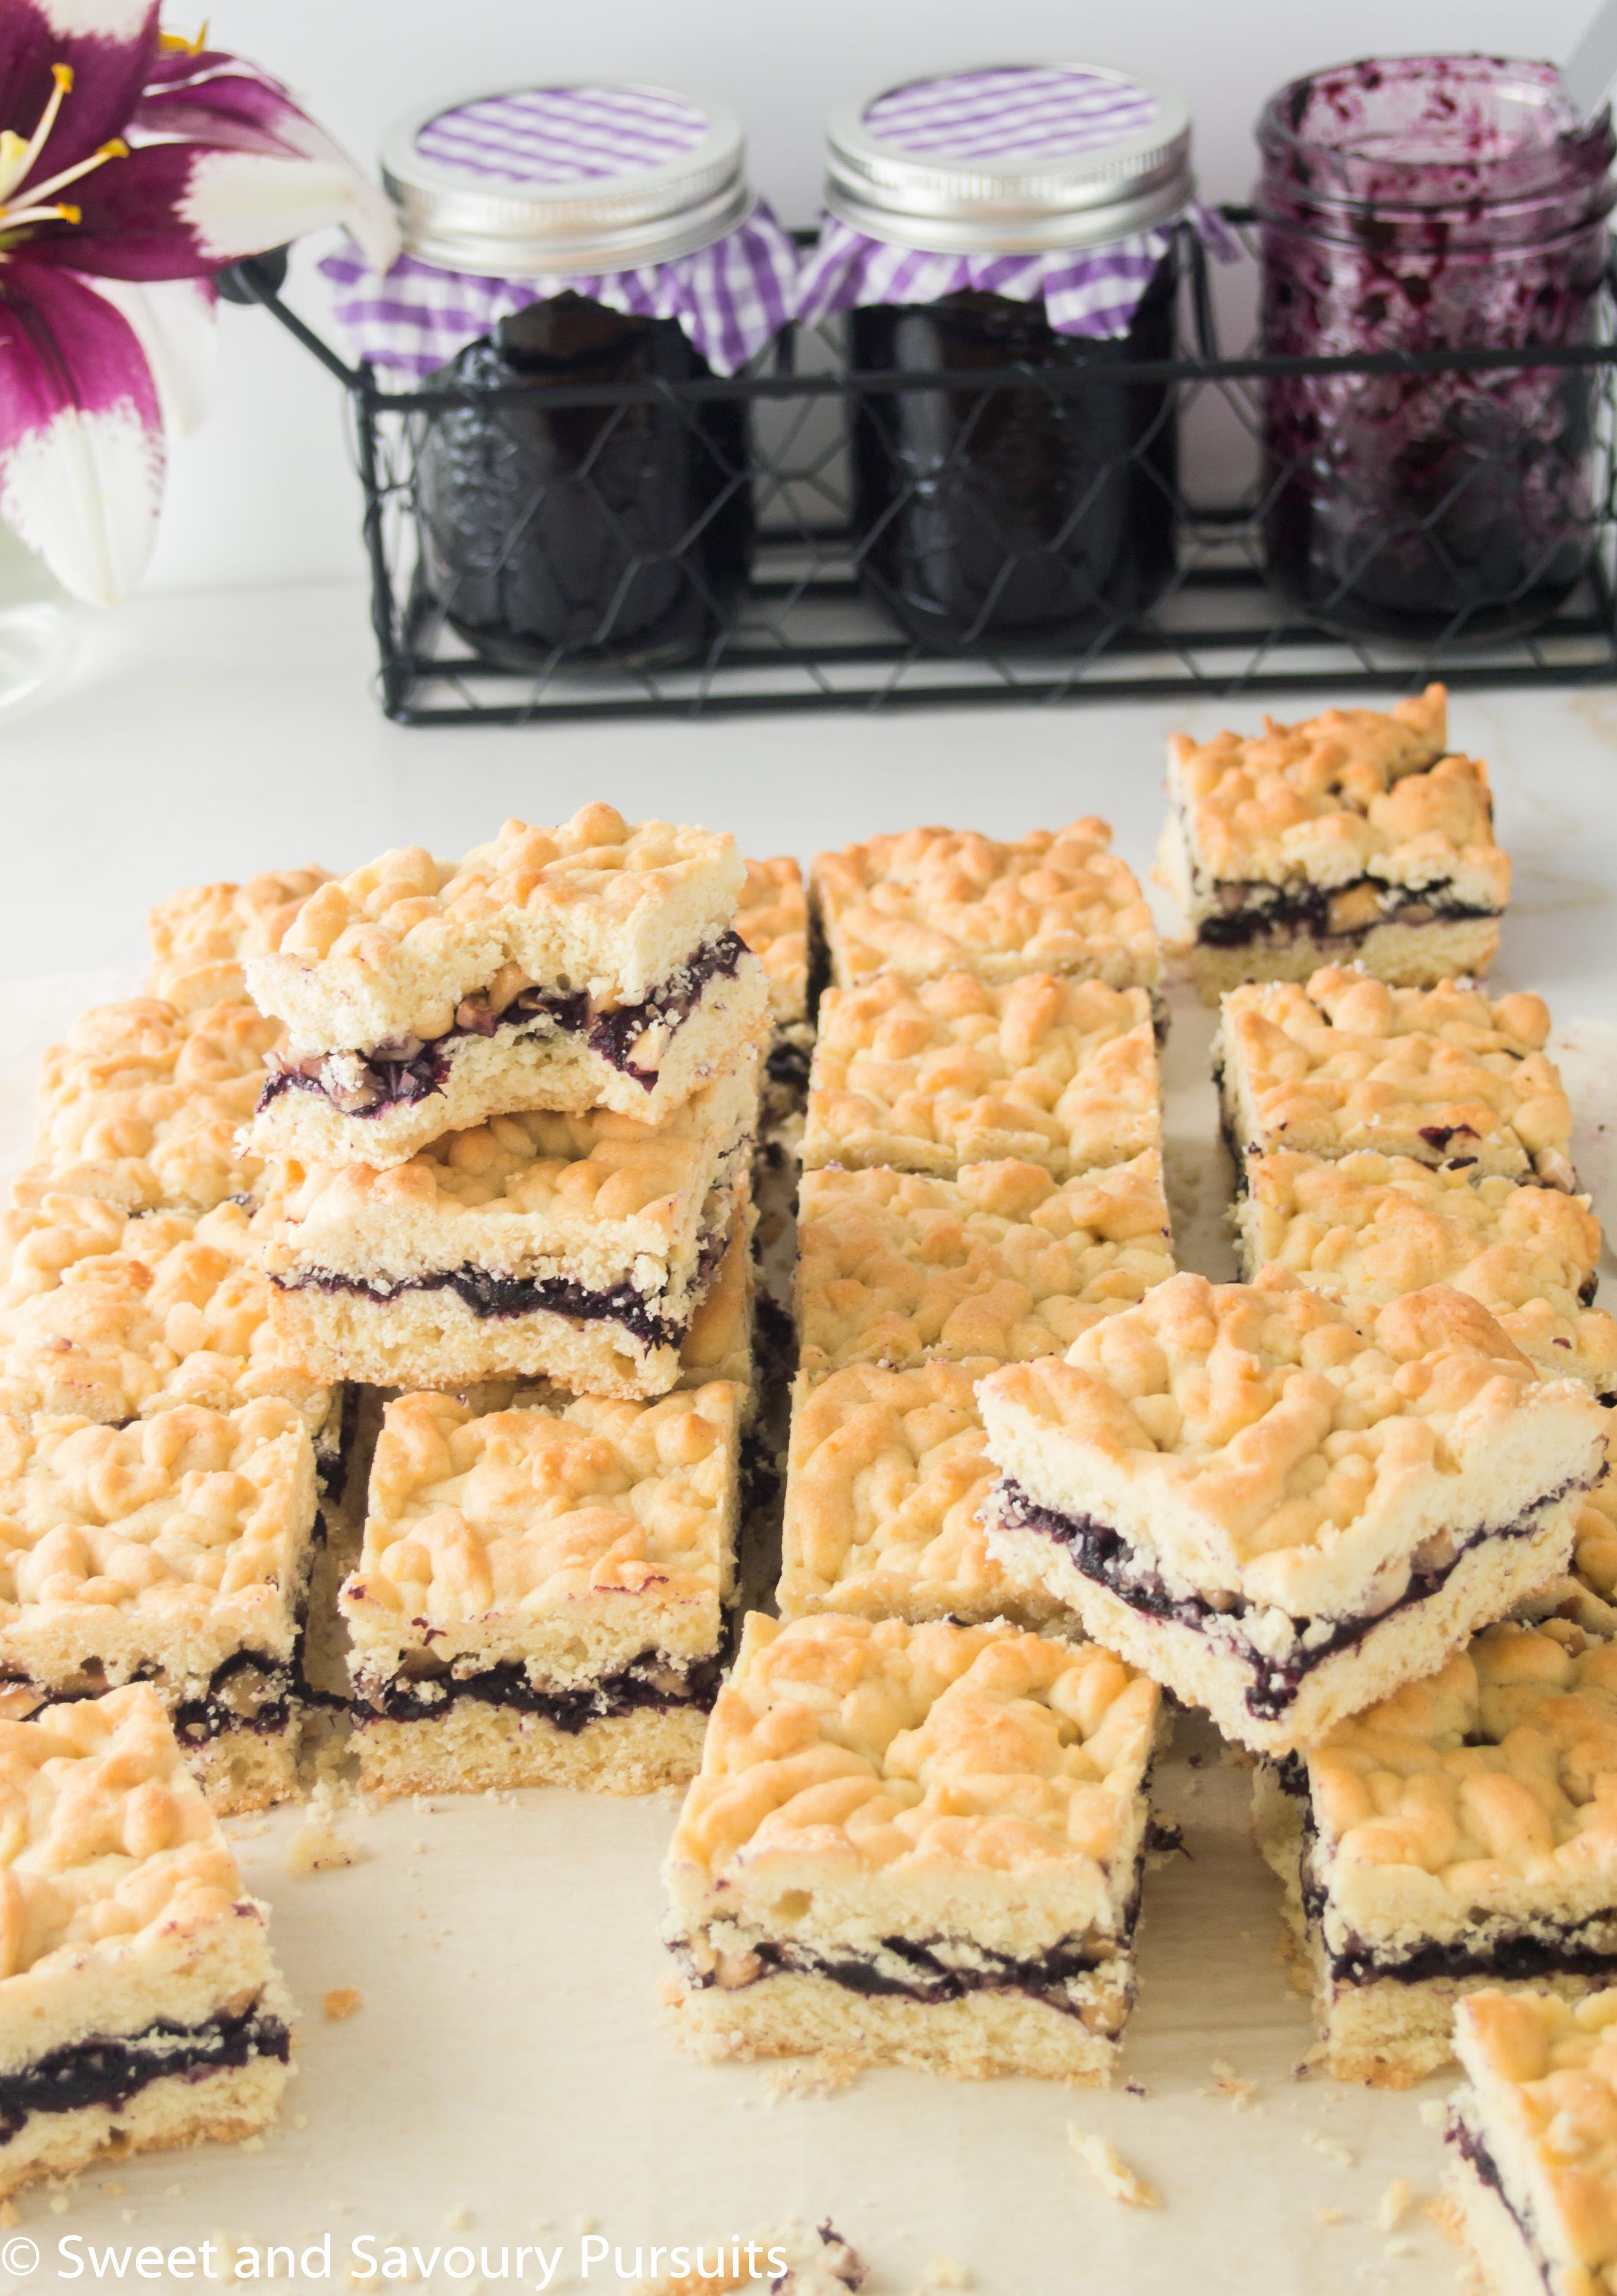 Blueberry Jam and Hazelnut Bars - Sweet and Savoury Pursuits